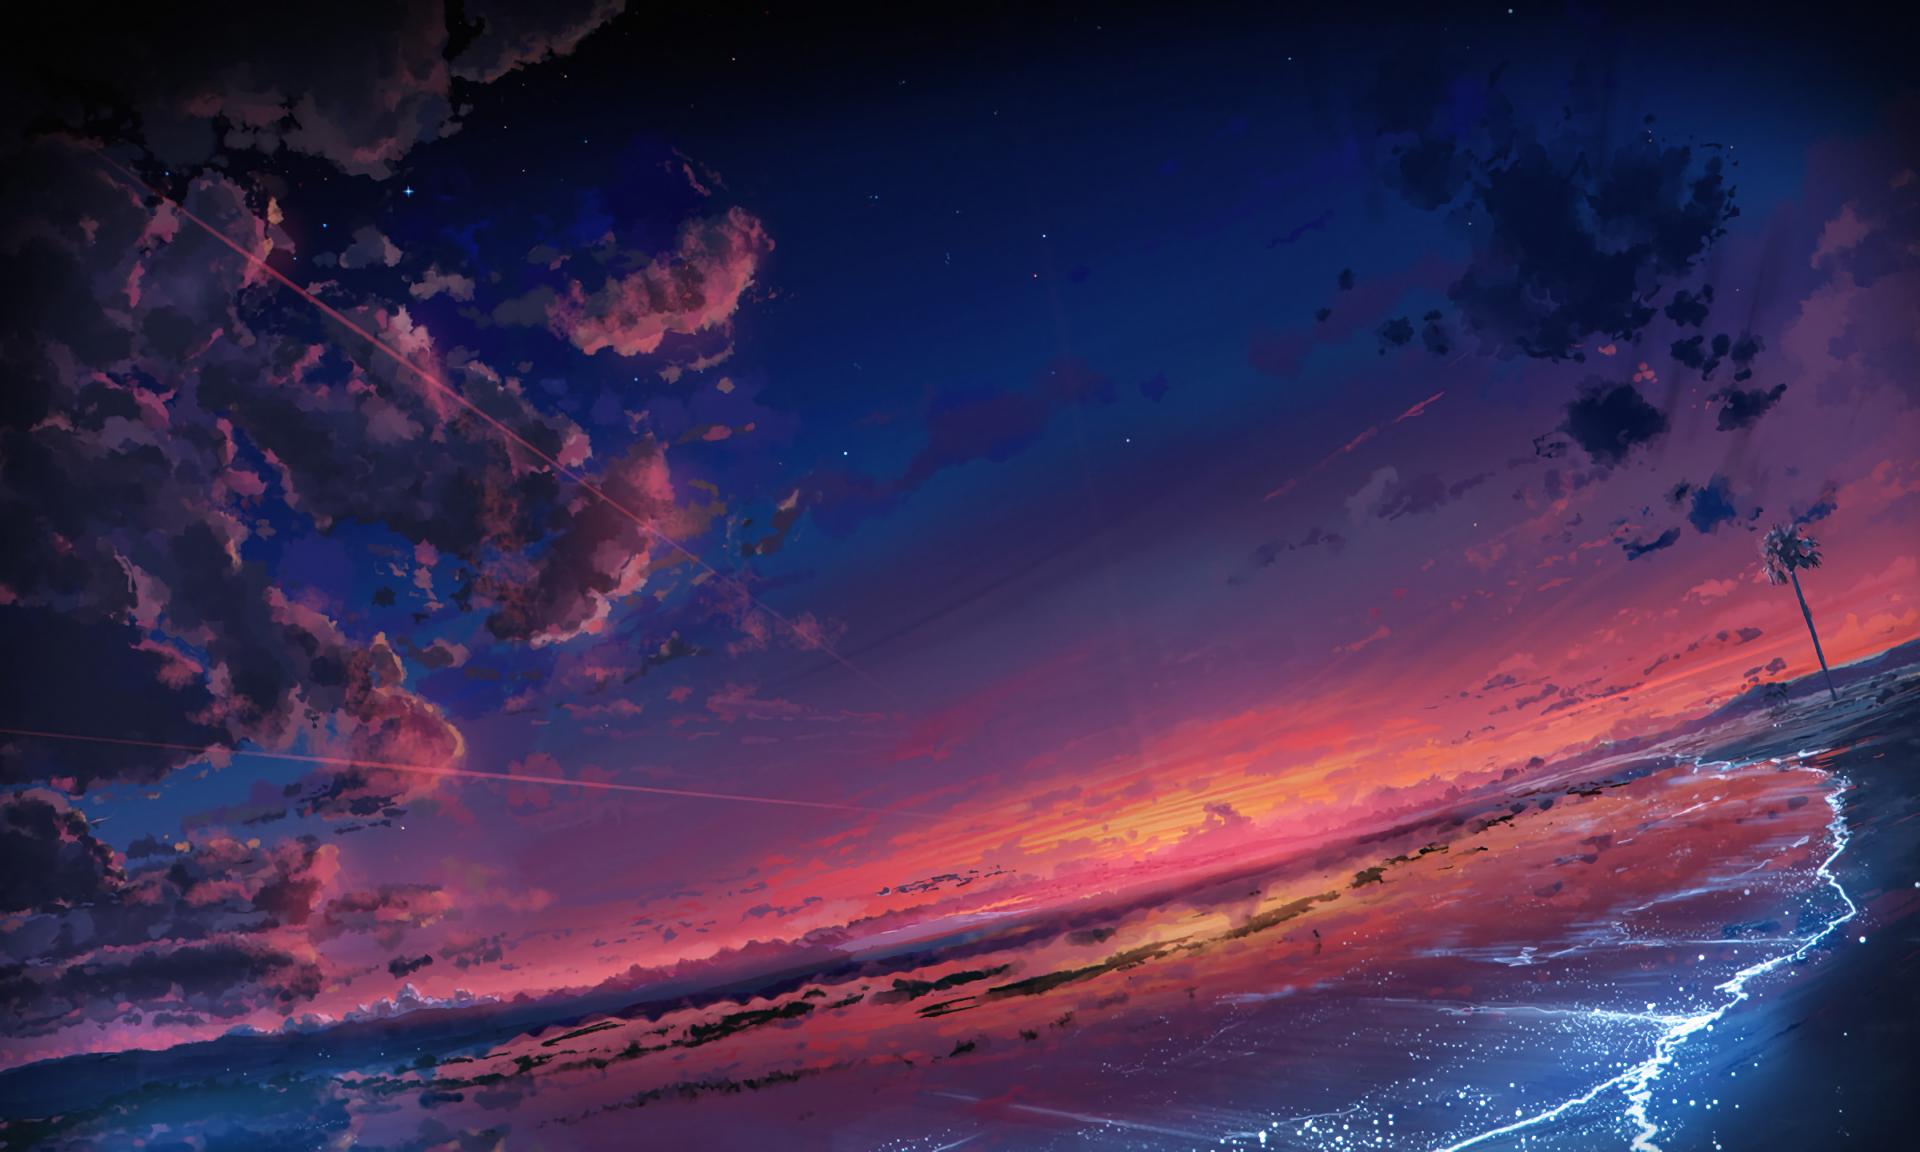 Anime - Original  Sky Cloud Scenic Beach Sunset Wallpaper